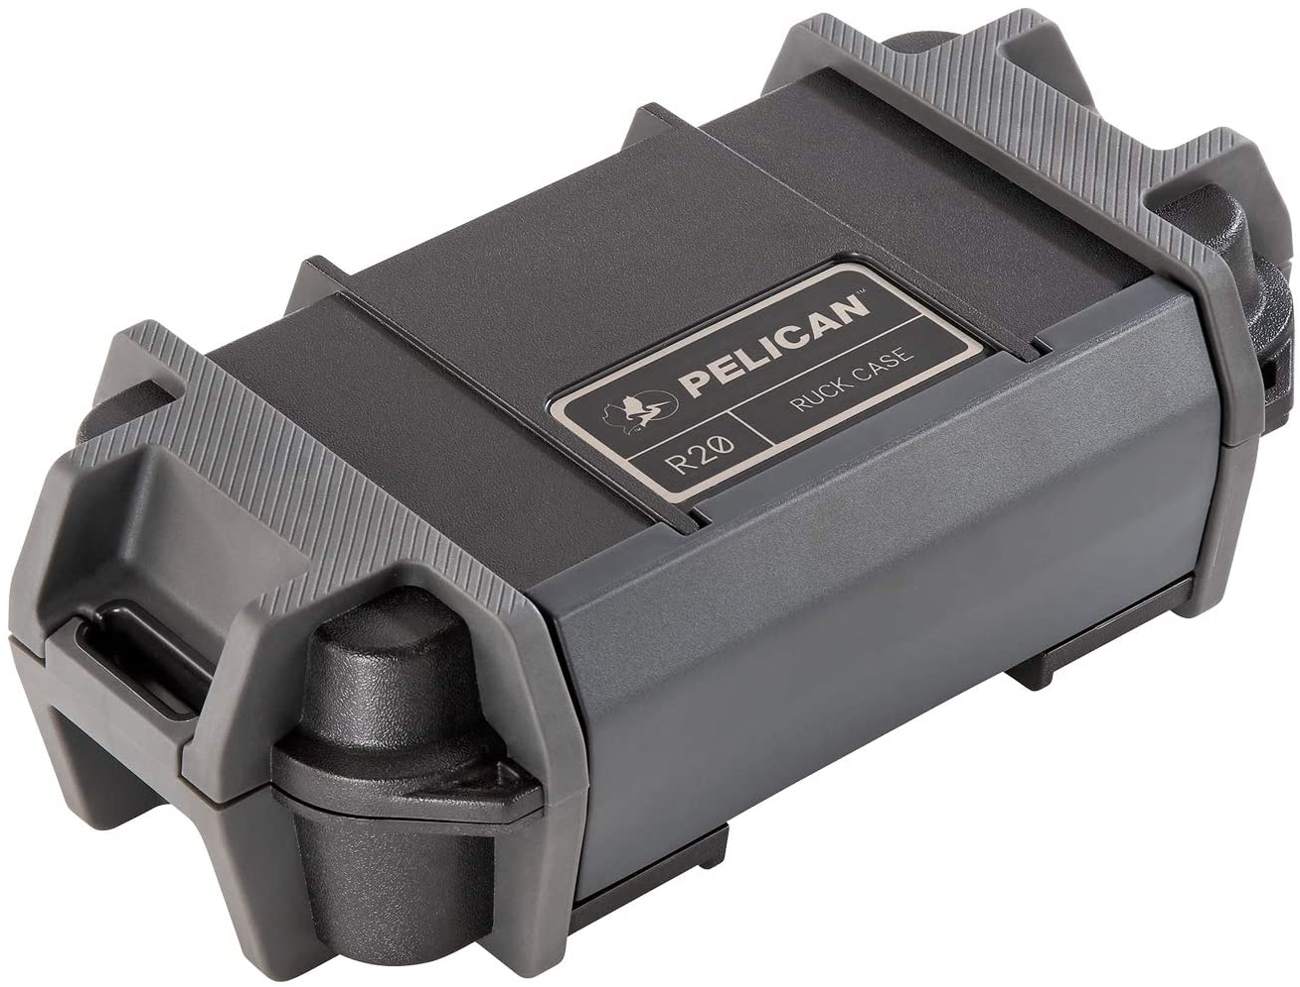 Pelican Ruck R20 Case Black (RKR200-0000-BLK)